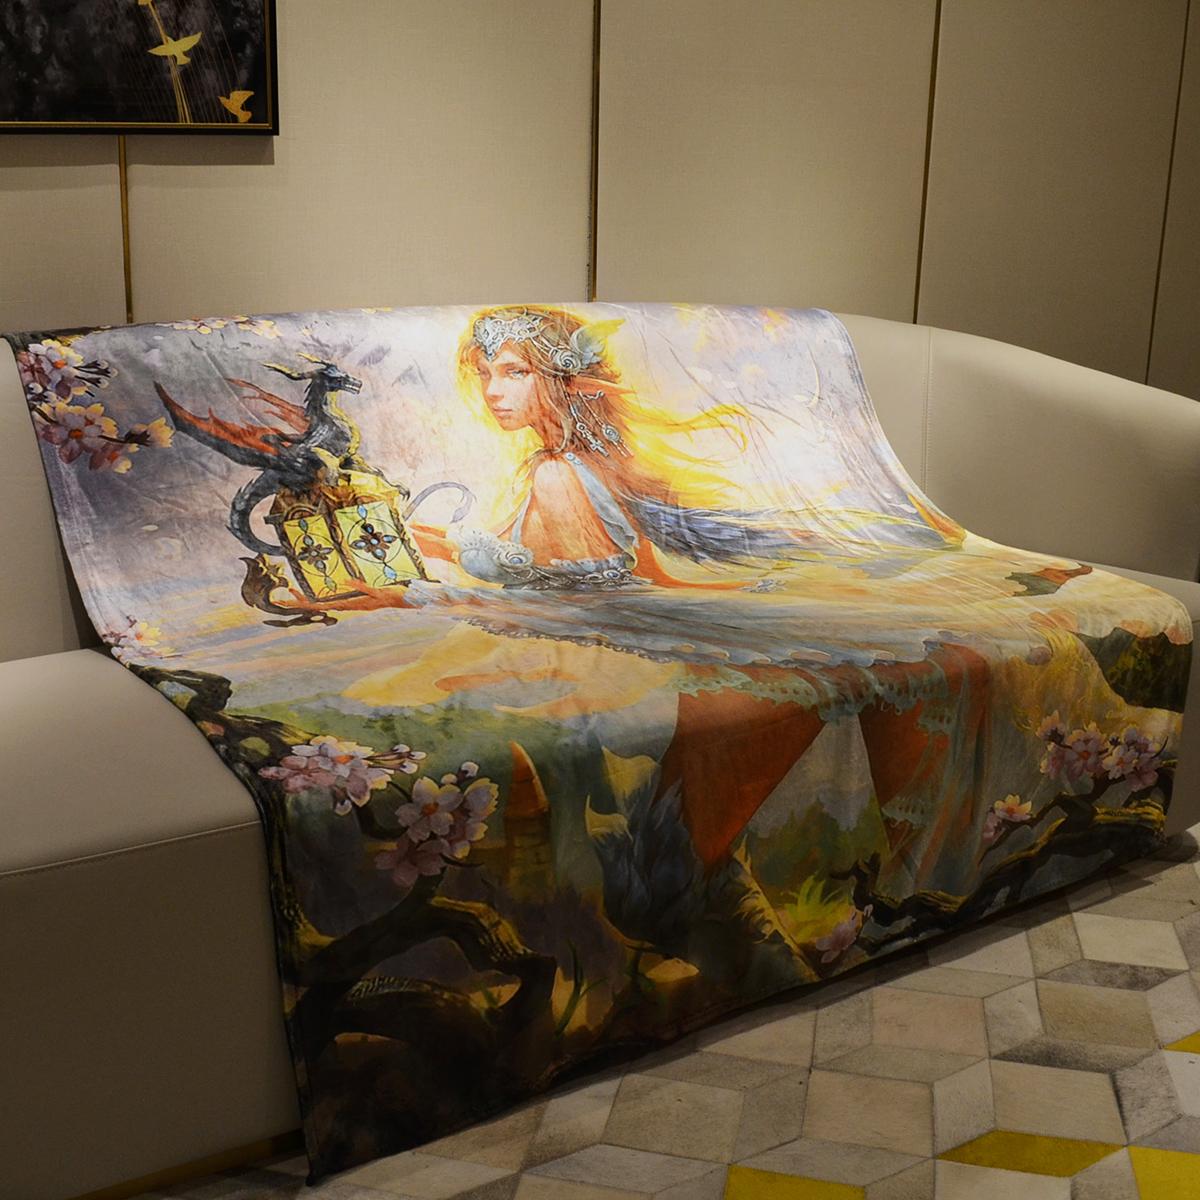 50*60 inch blanket